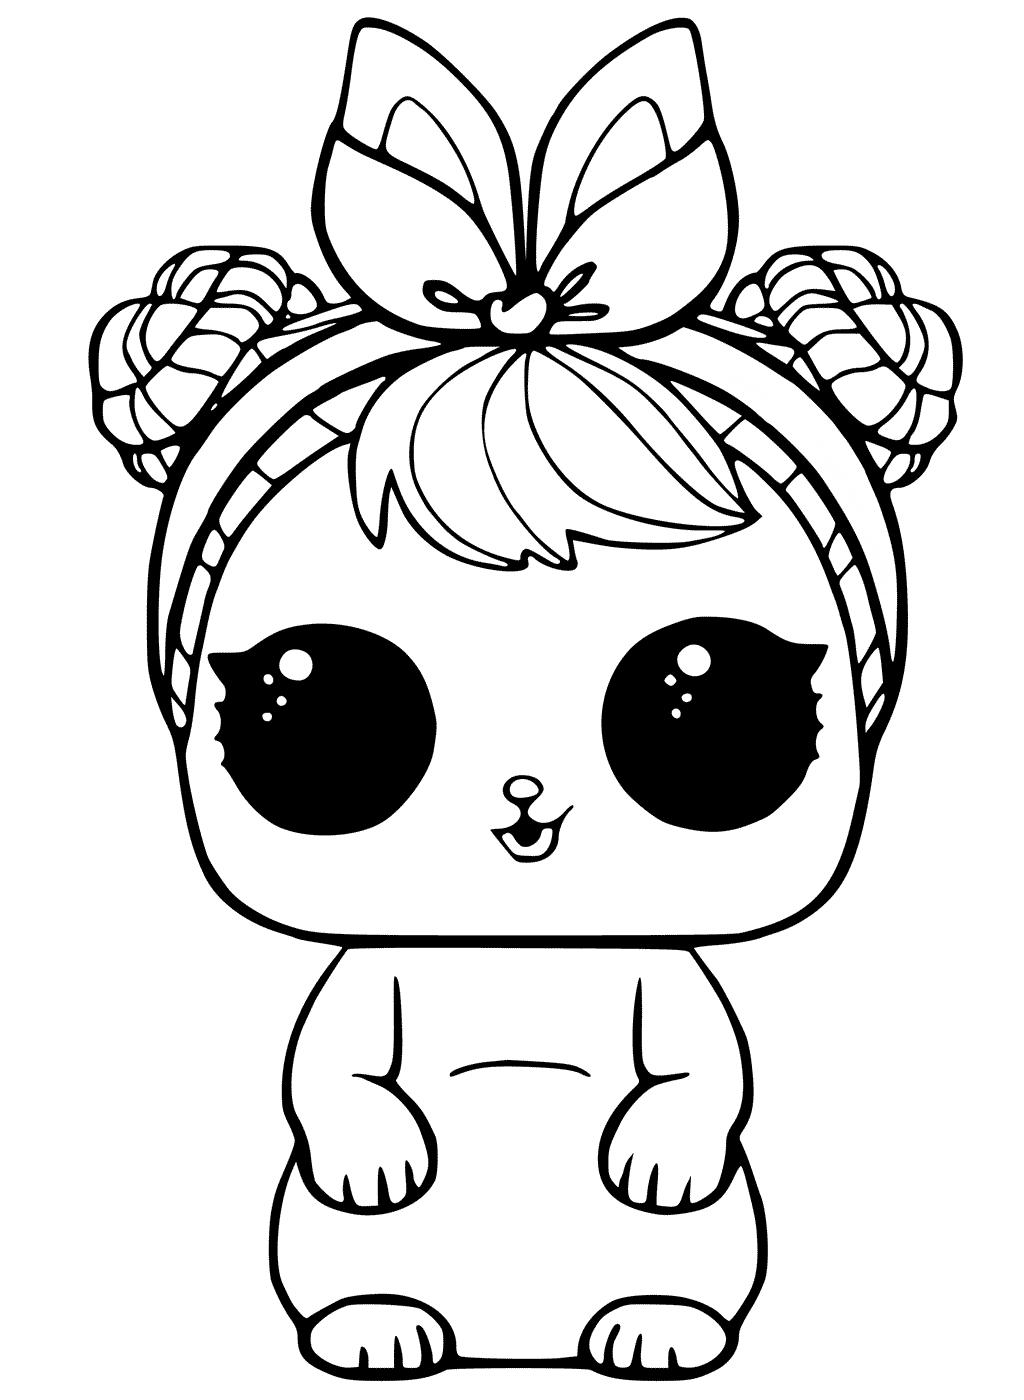 Кукла ЛОЛ питомец зайчик - Куклы LOL - Раскраски антистресс